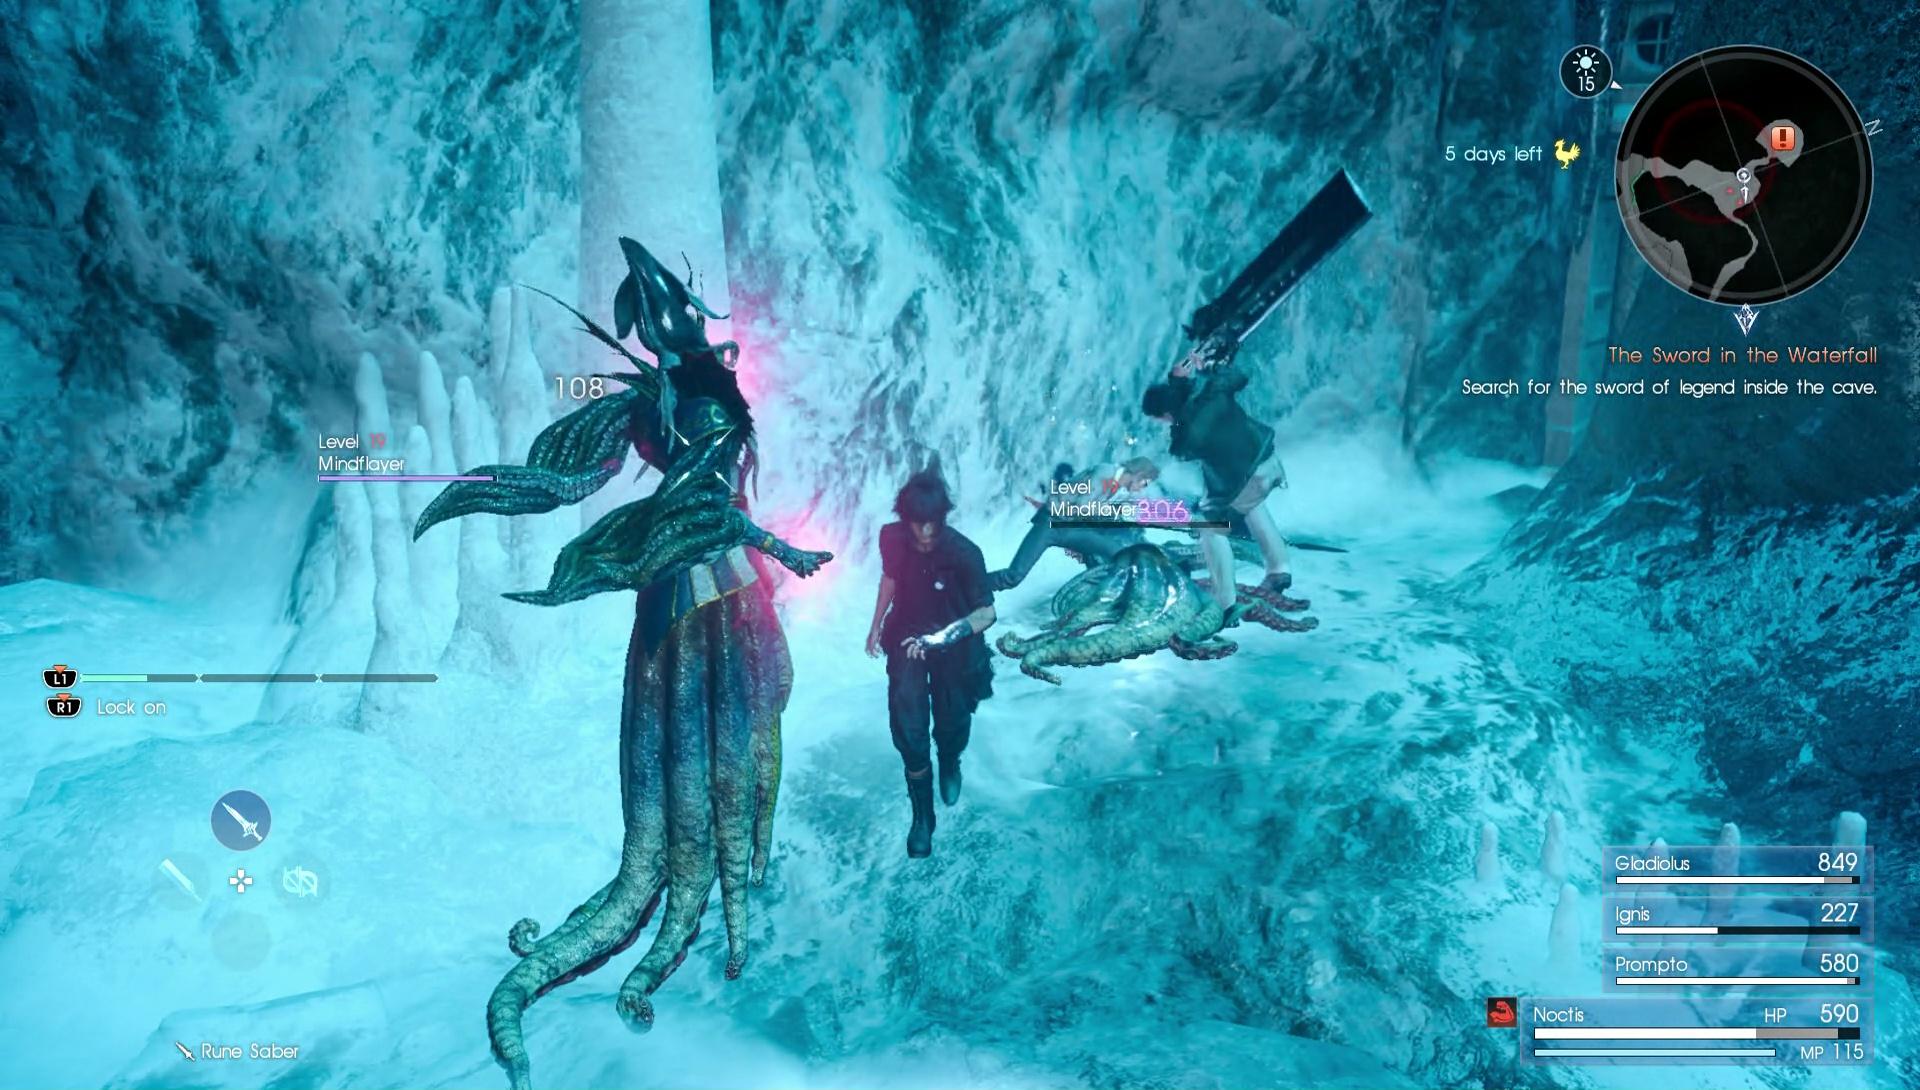 FFXV Greyshire Glacial Grotto Dungeon Walkthrough